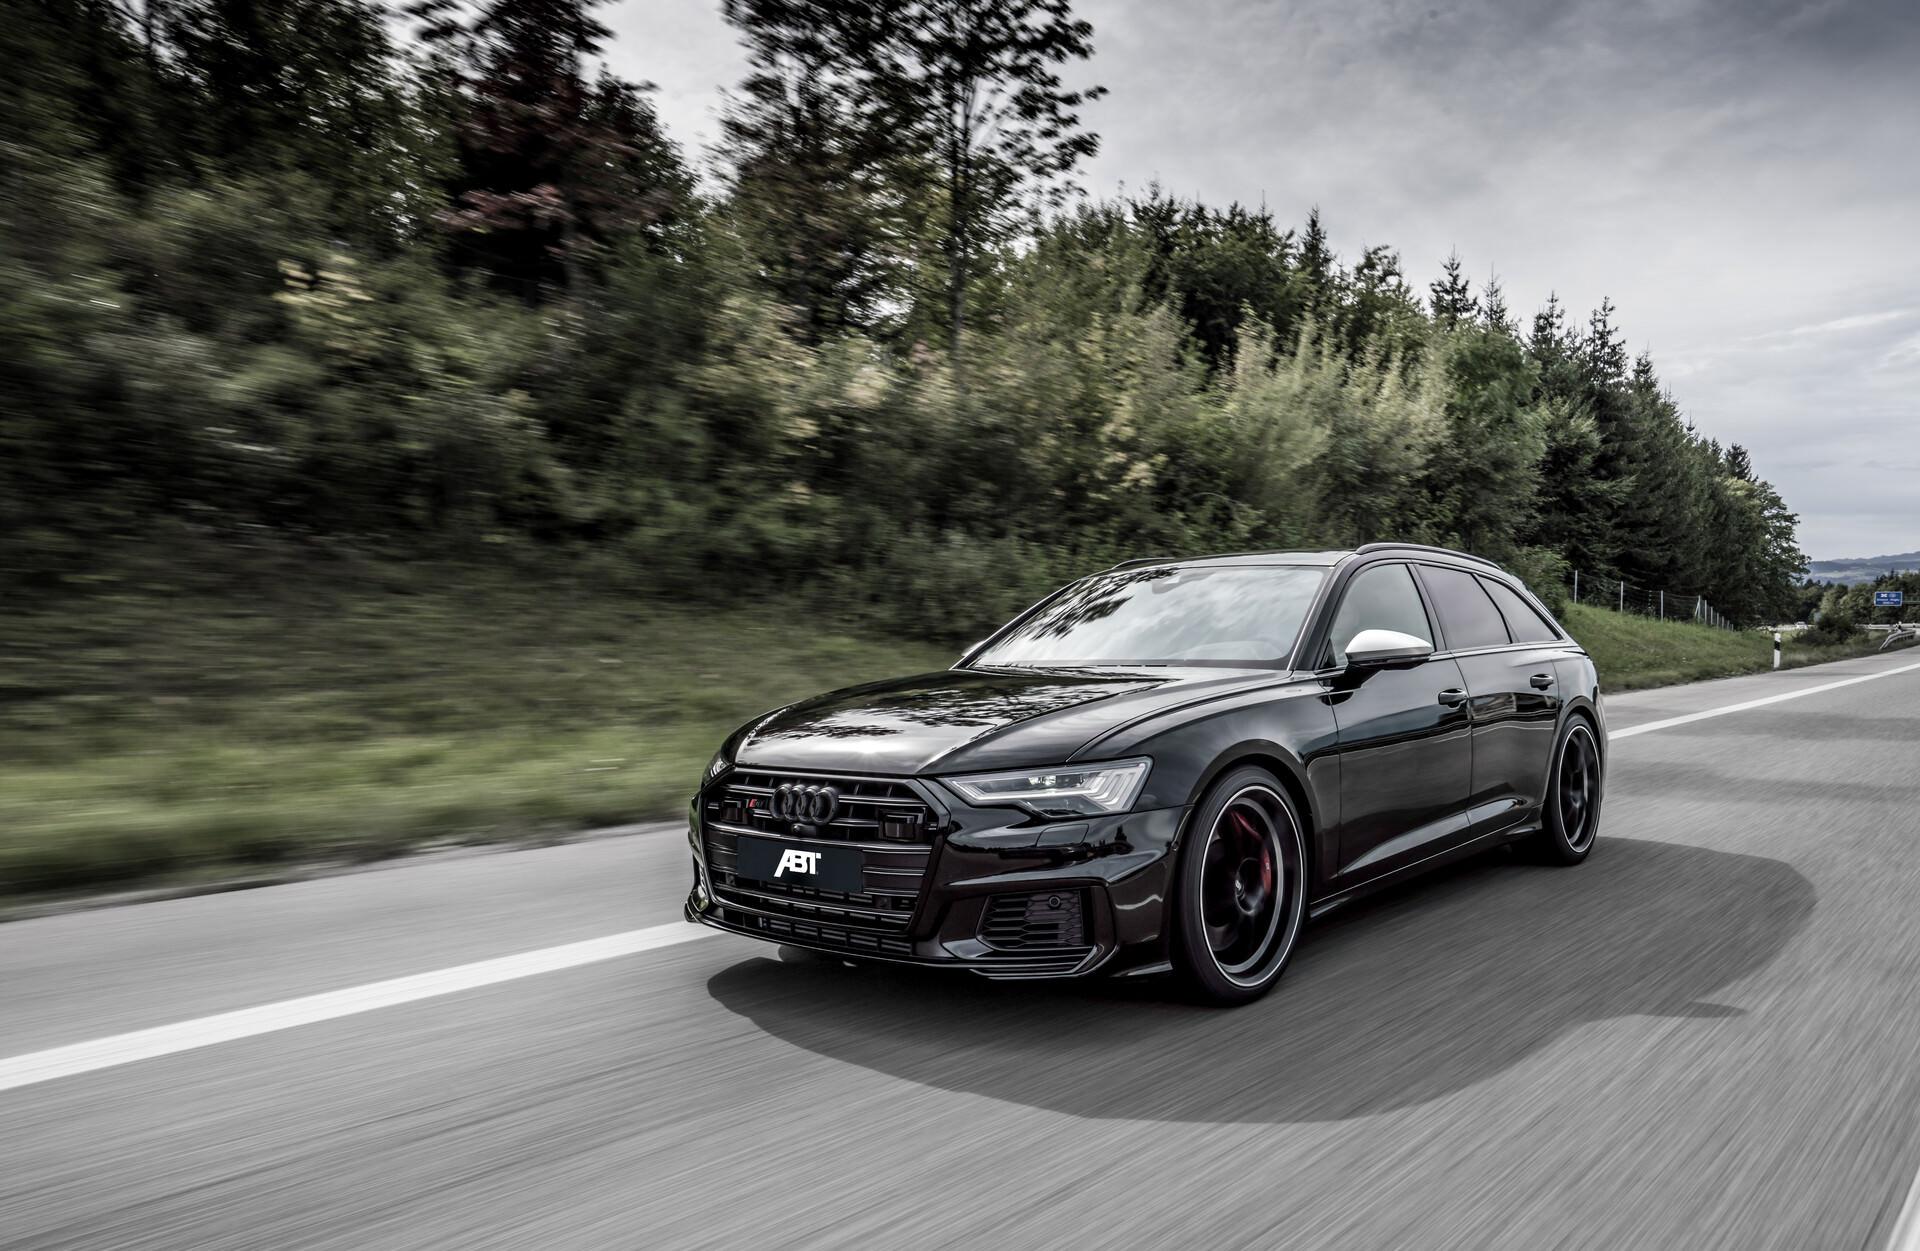 Abt Audi A6 S6 4k00 2018 Pitlane Tuning Shop